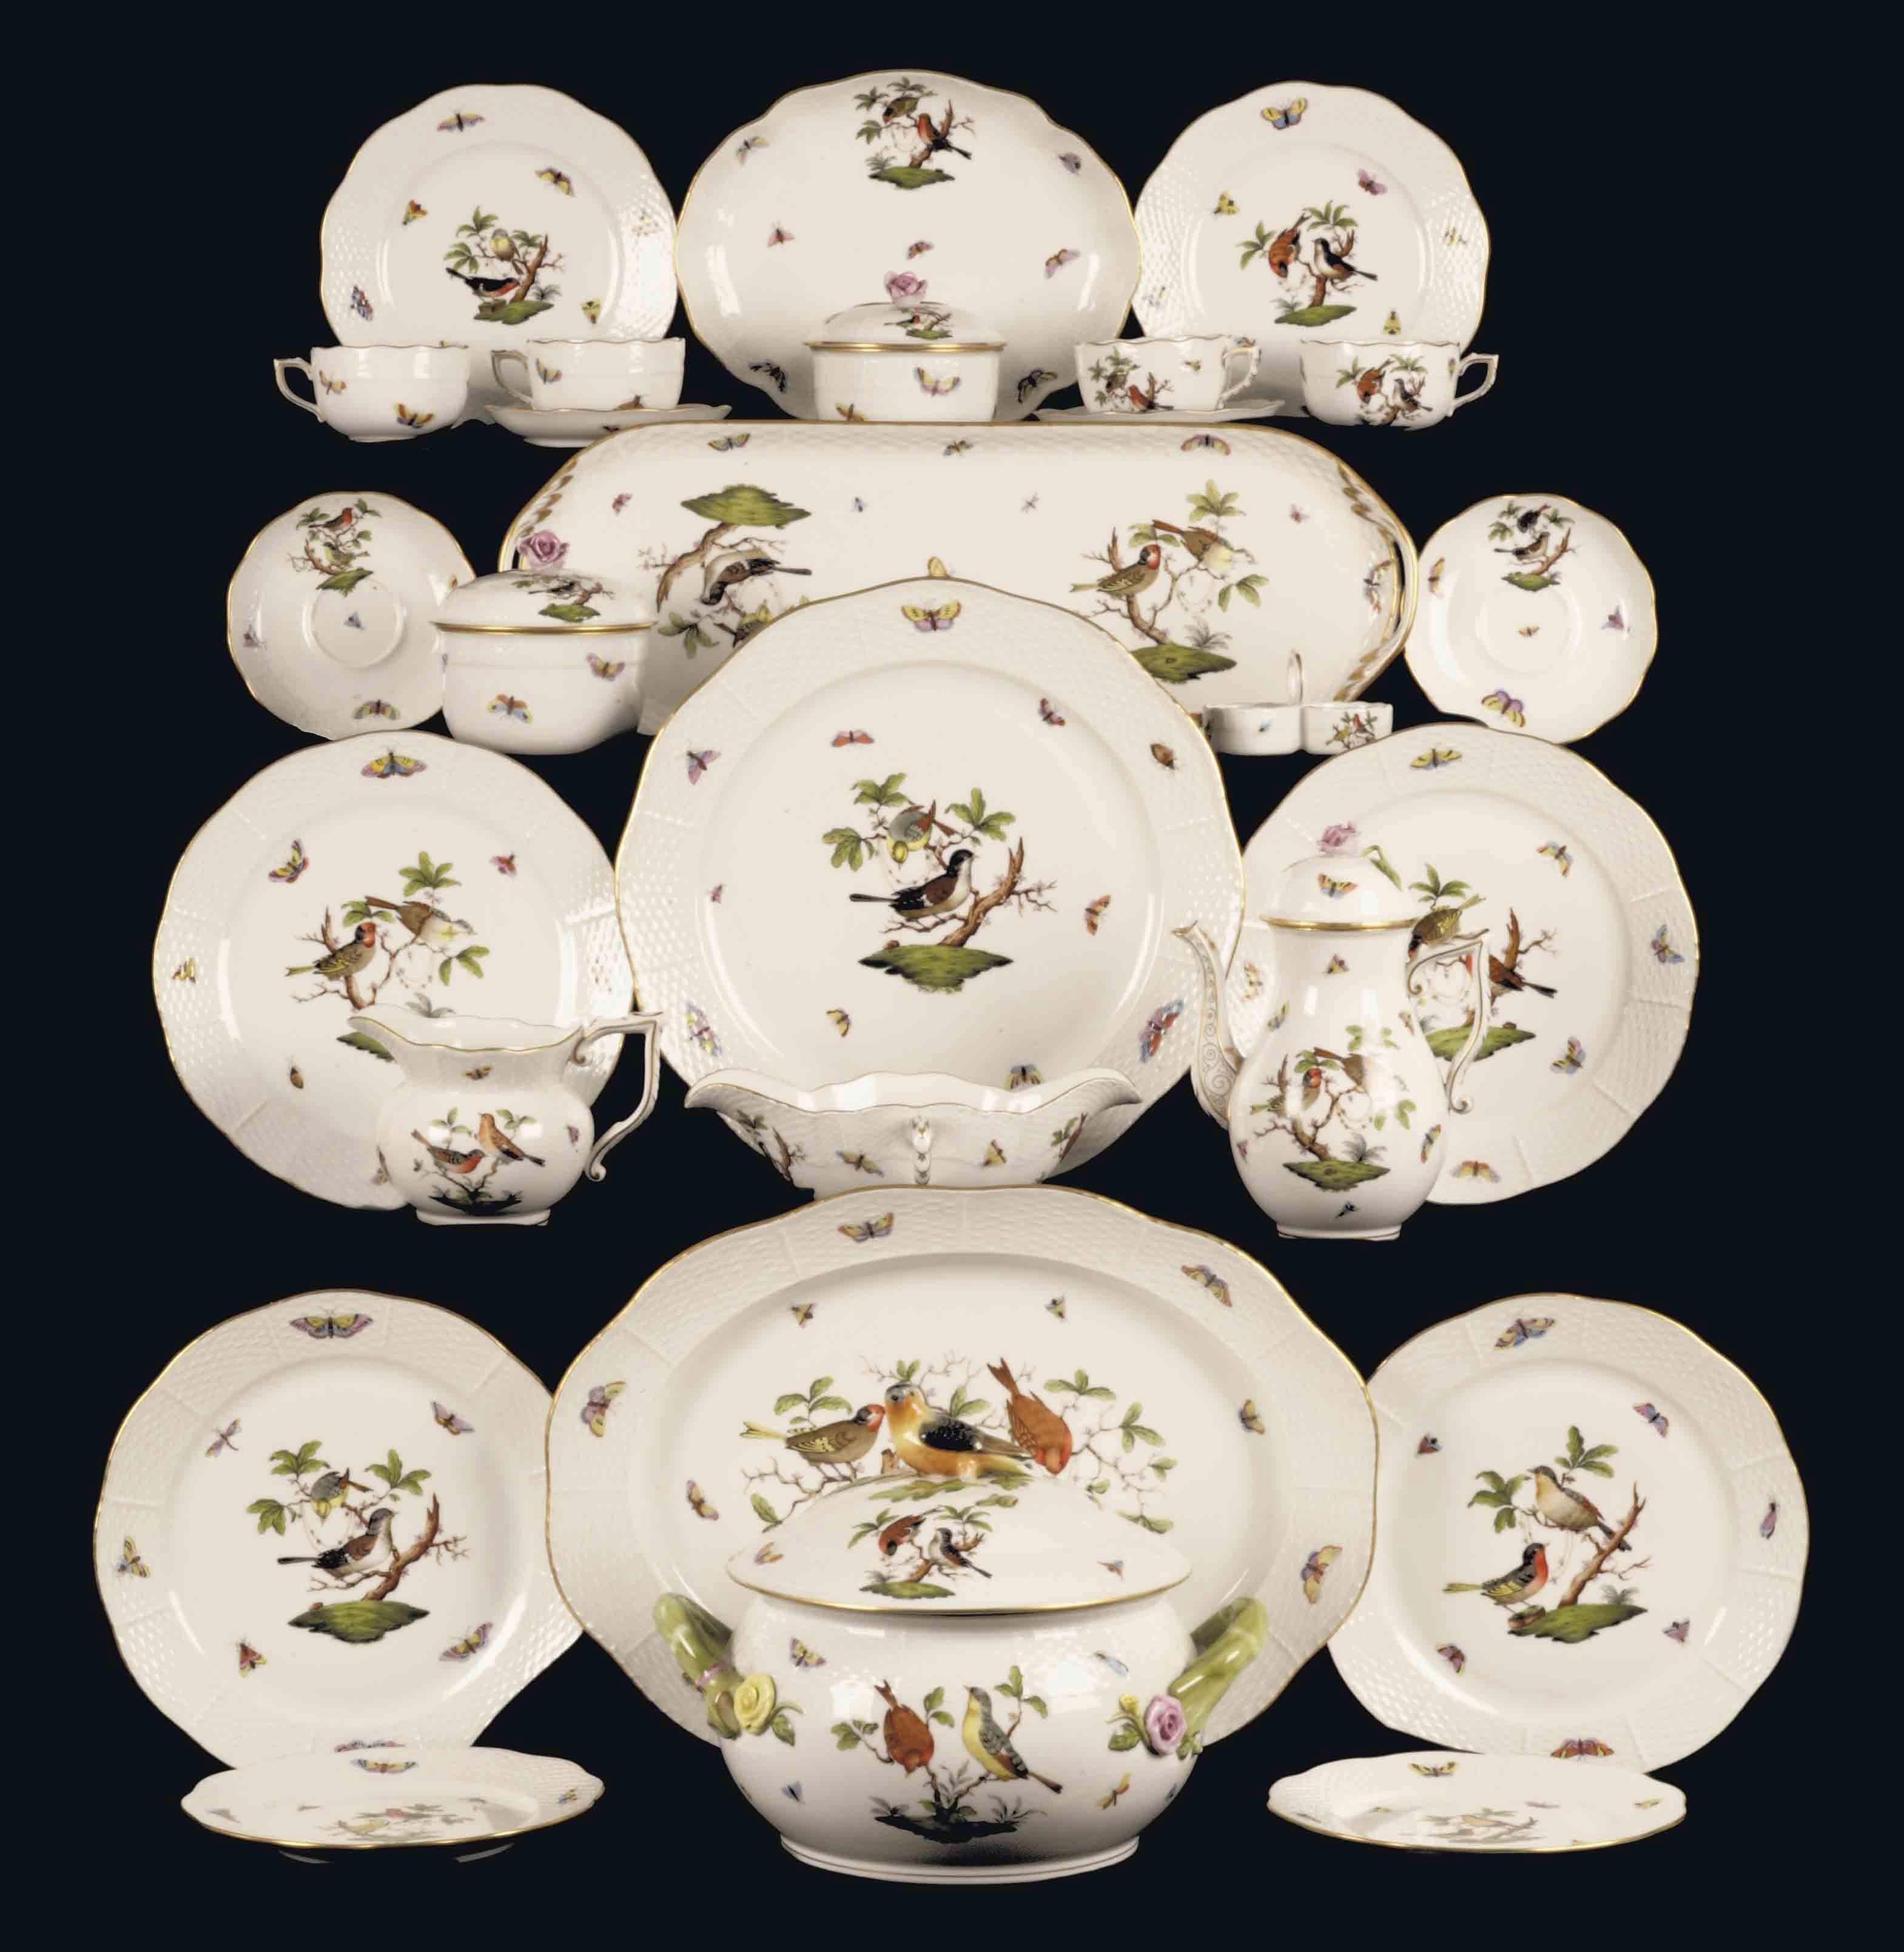 A Herend 'Rothschild bird' dinner service